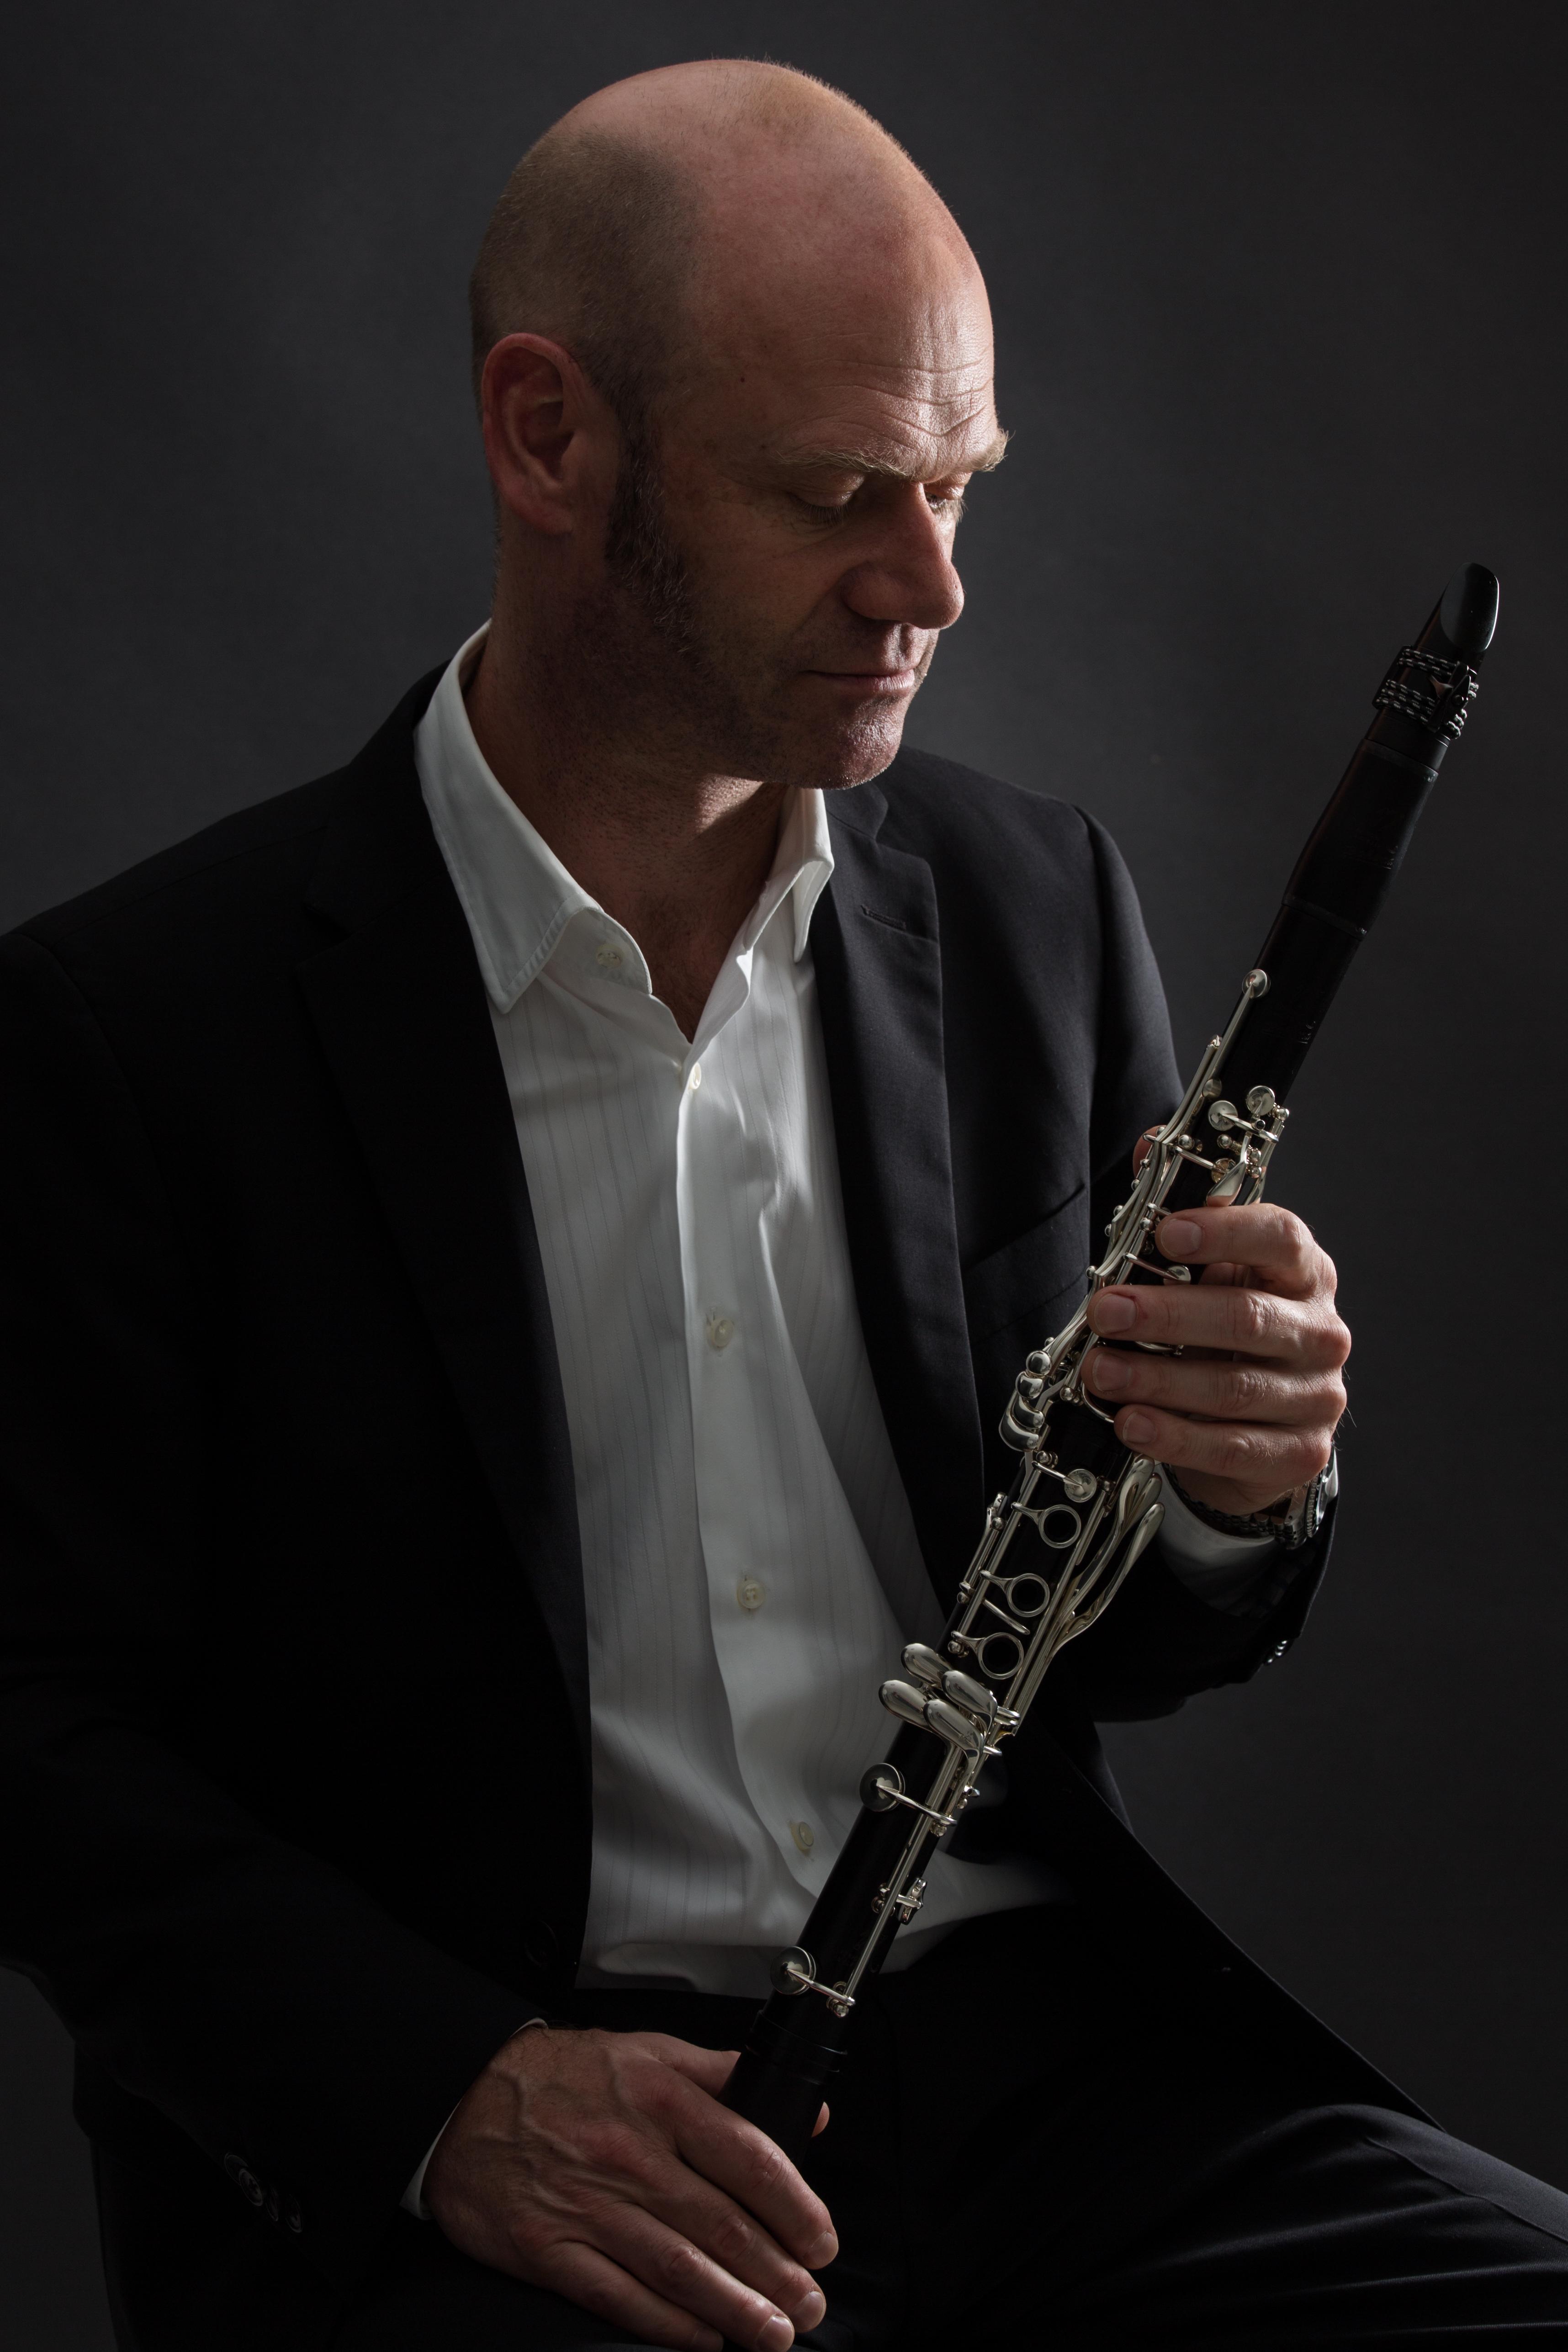 Pius Baumgartner RZ-Clarinet